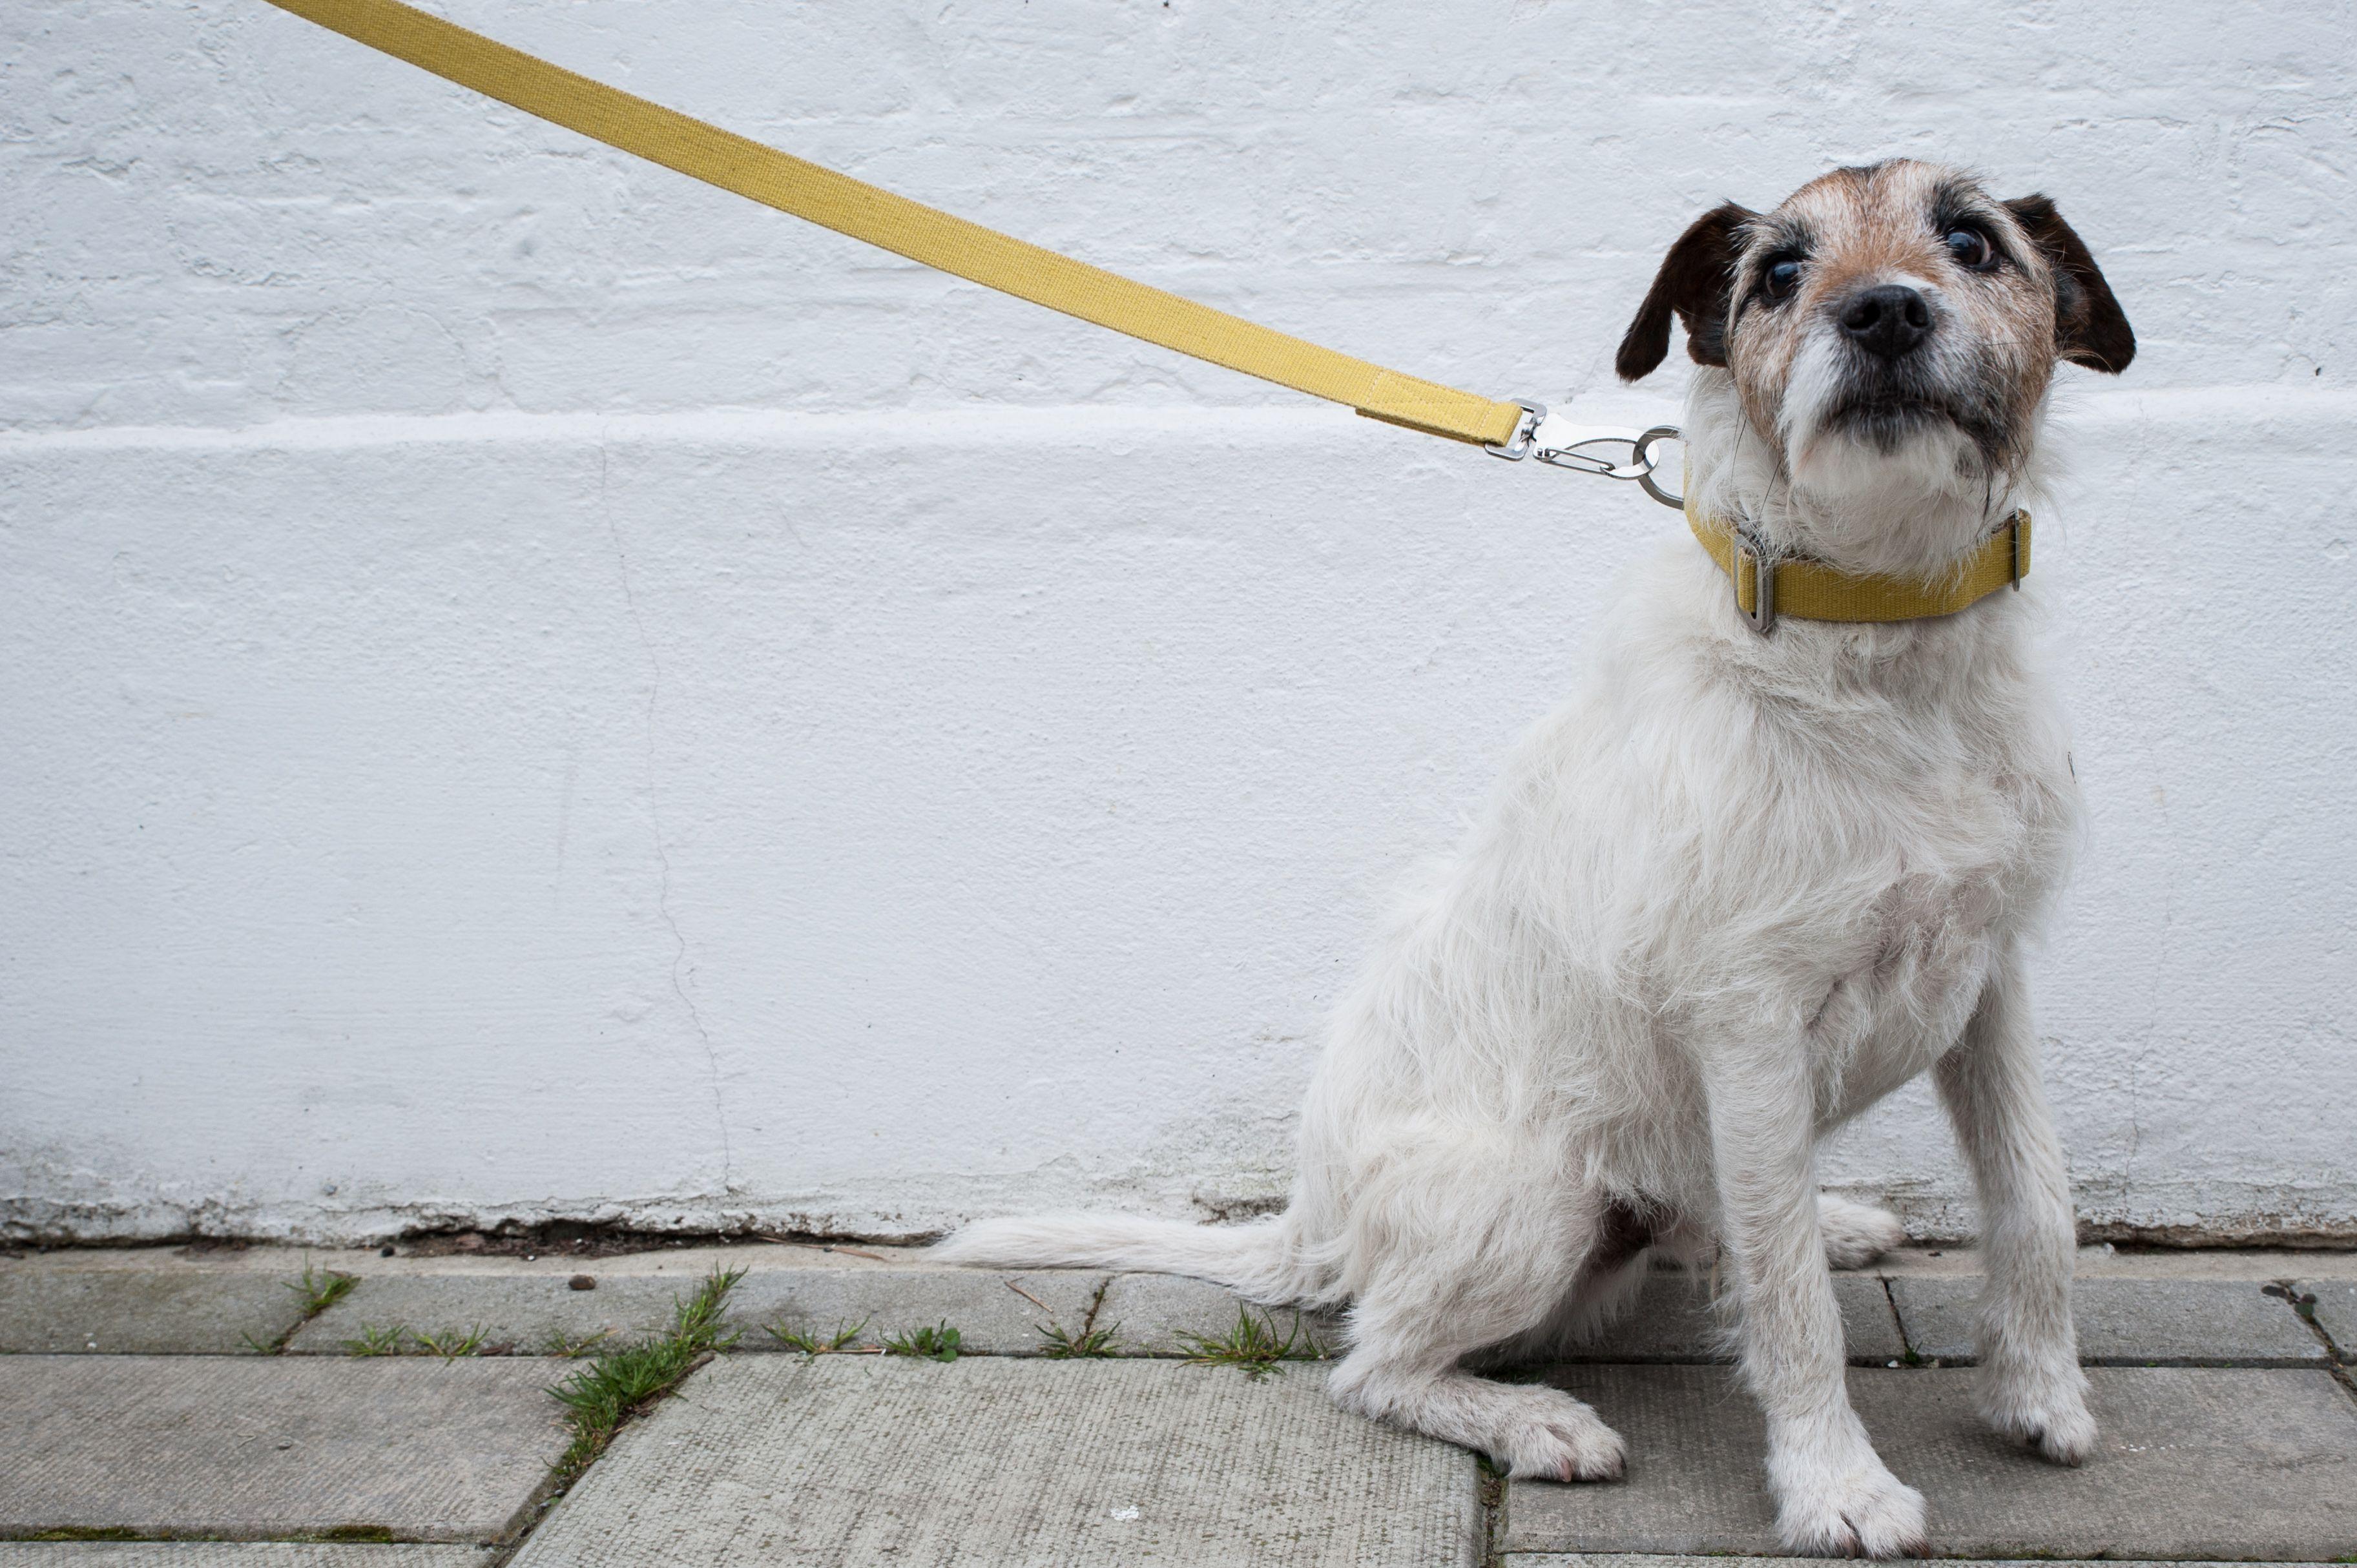 Murphy in yellow yellow dogcollar